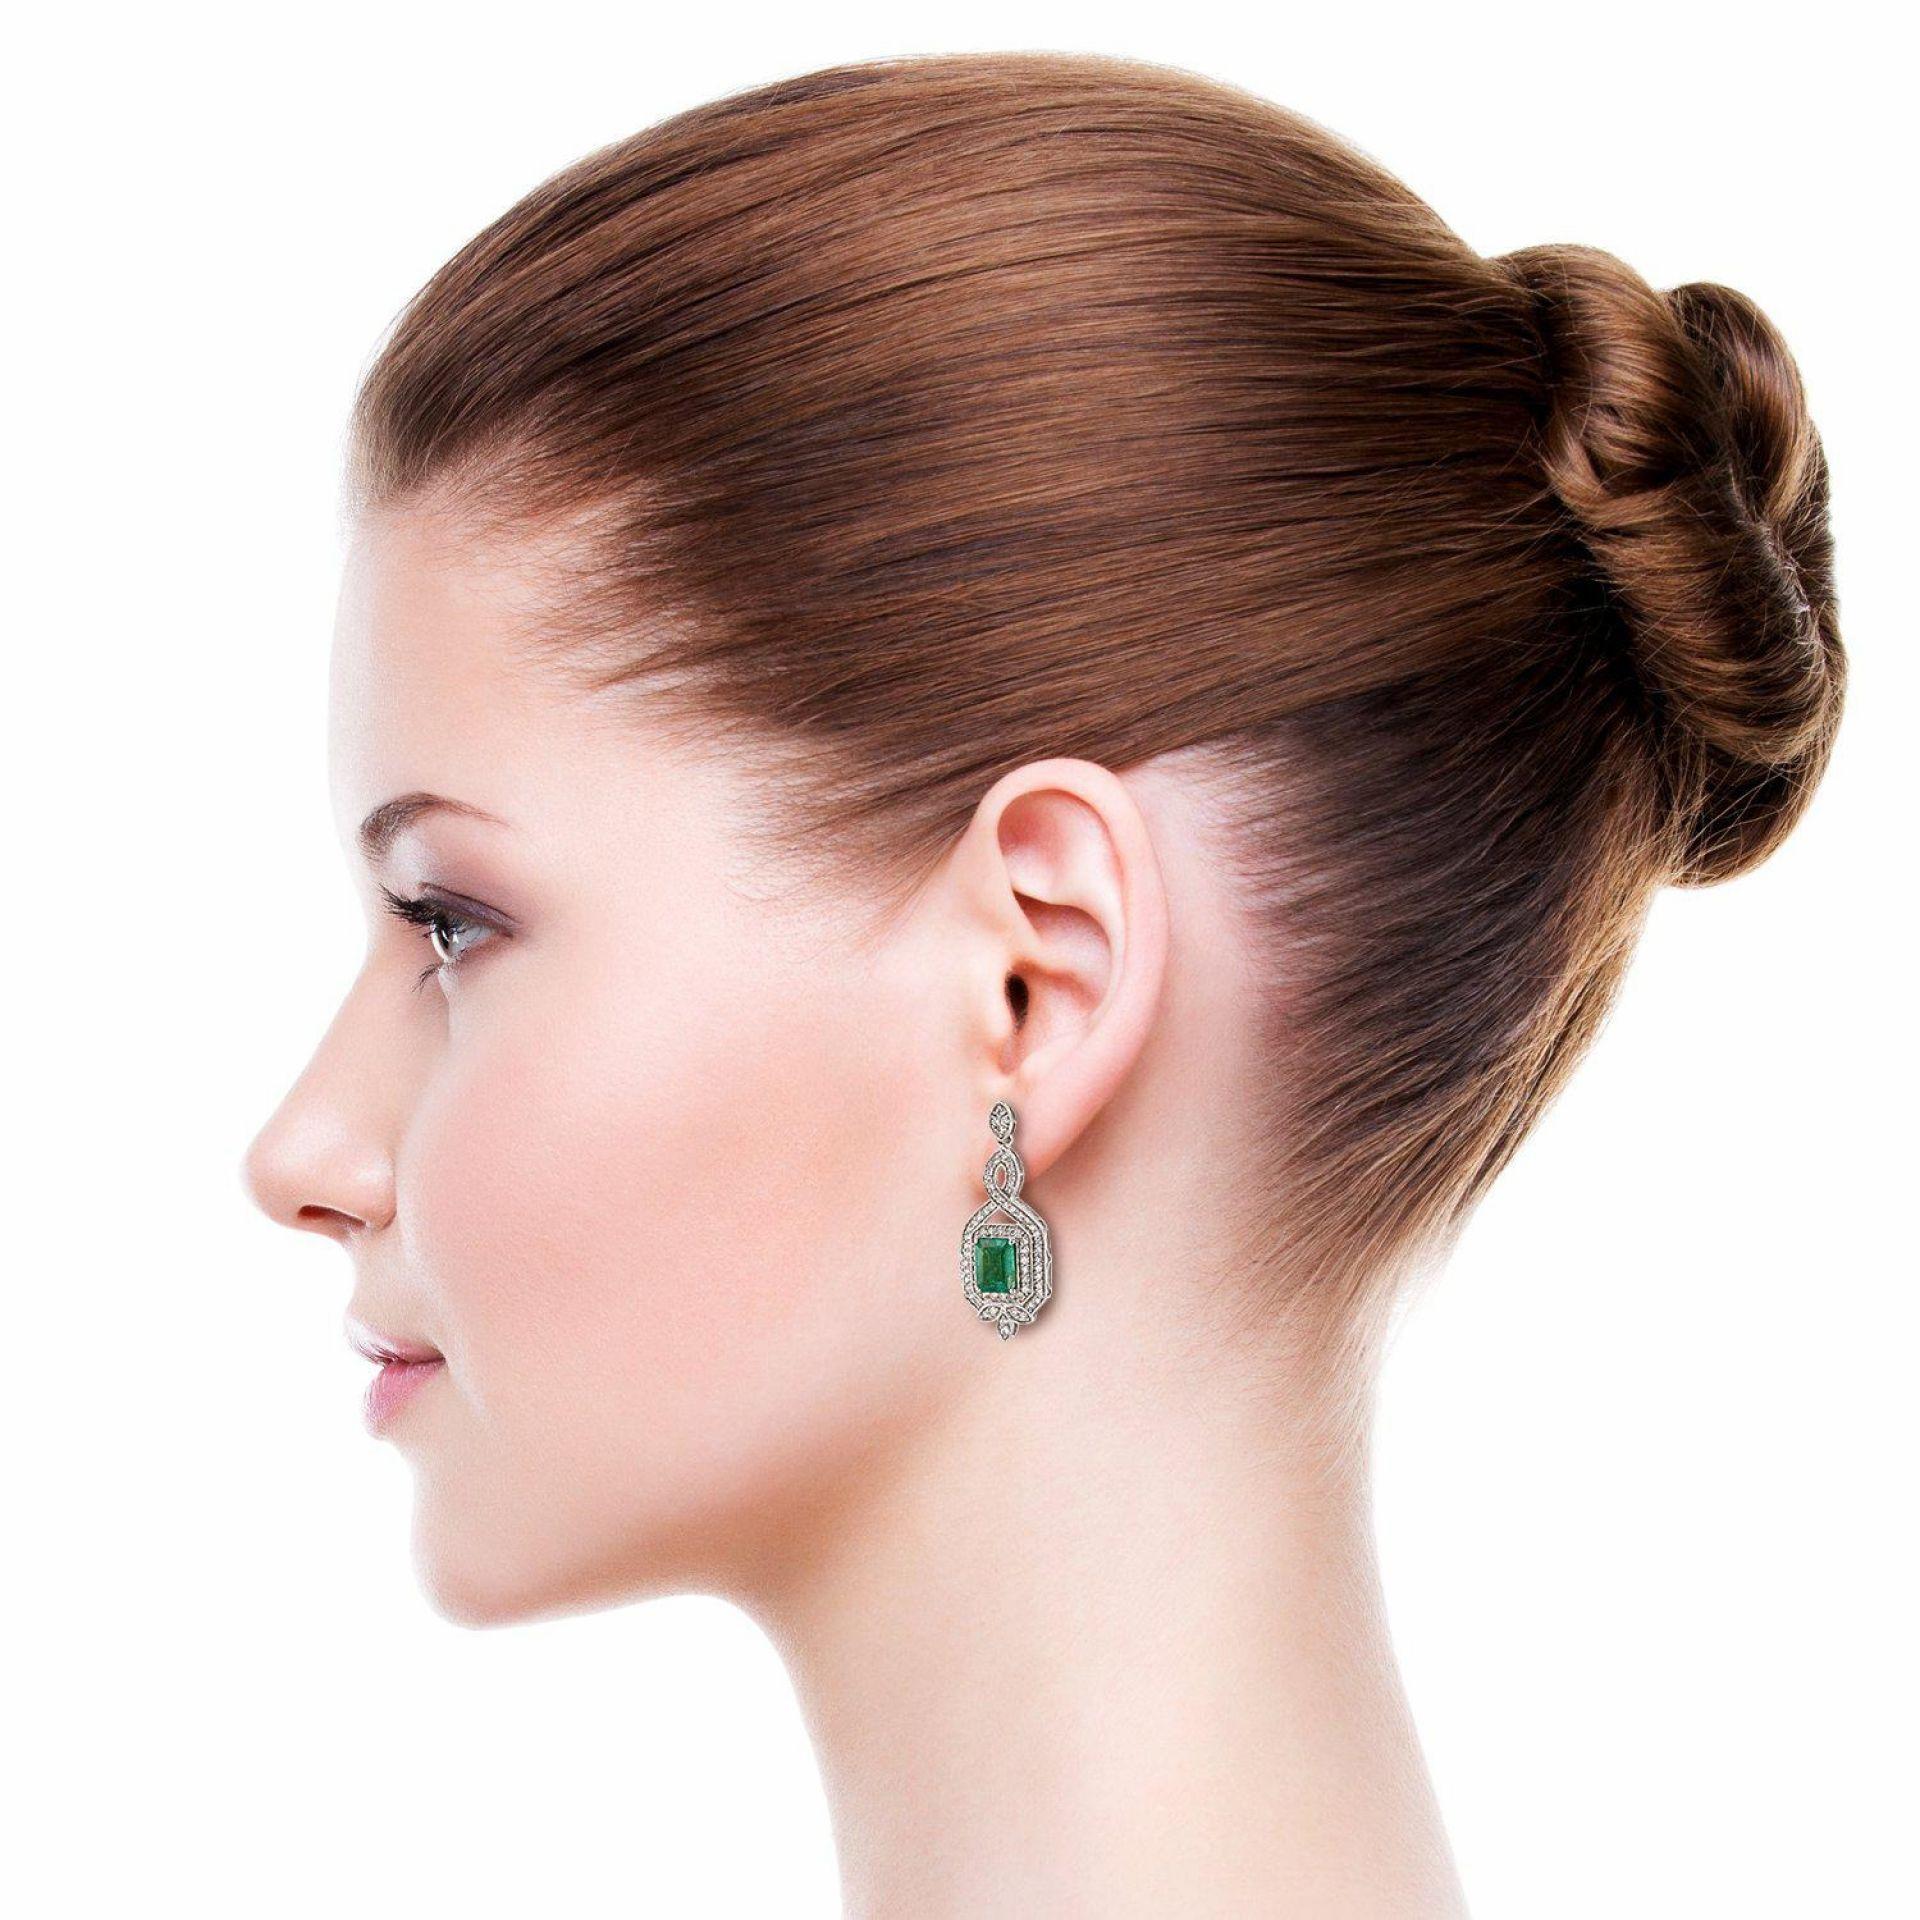 4.28ctw Emerald and 1.48ctw Diamond 18K White Gold Dangle Earrings